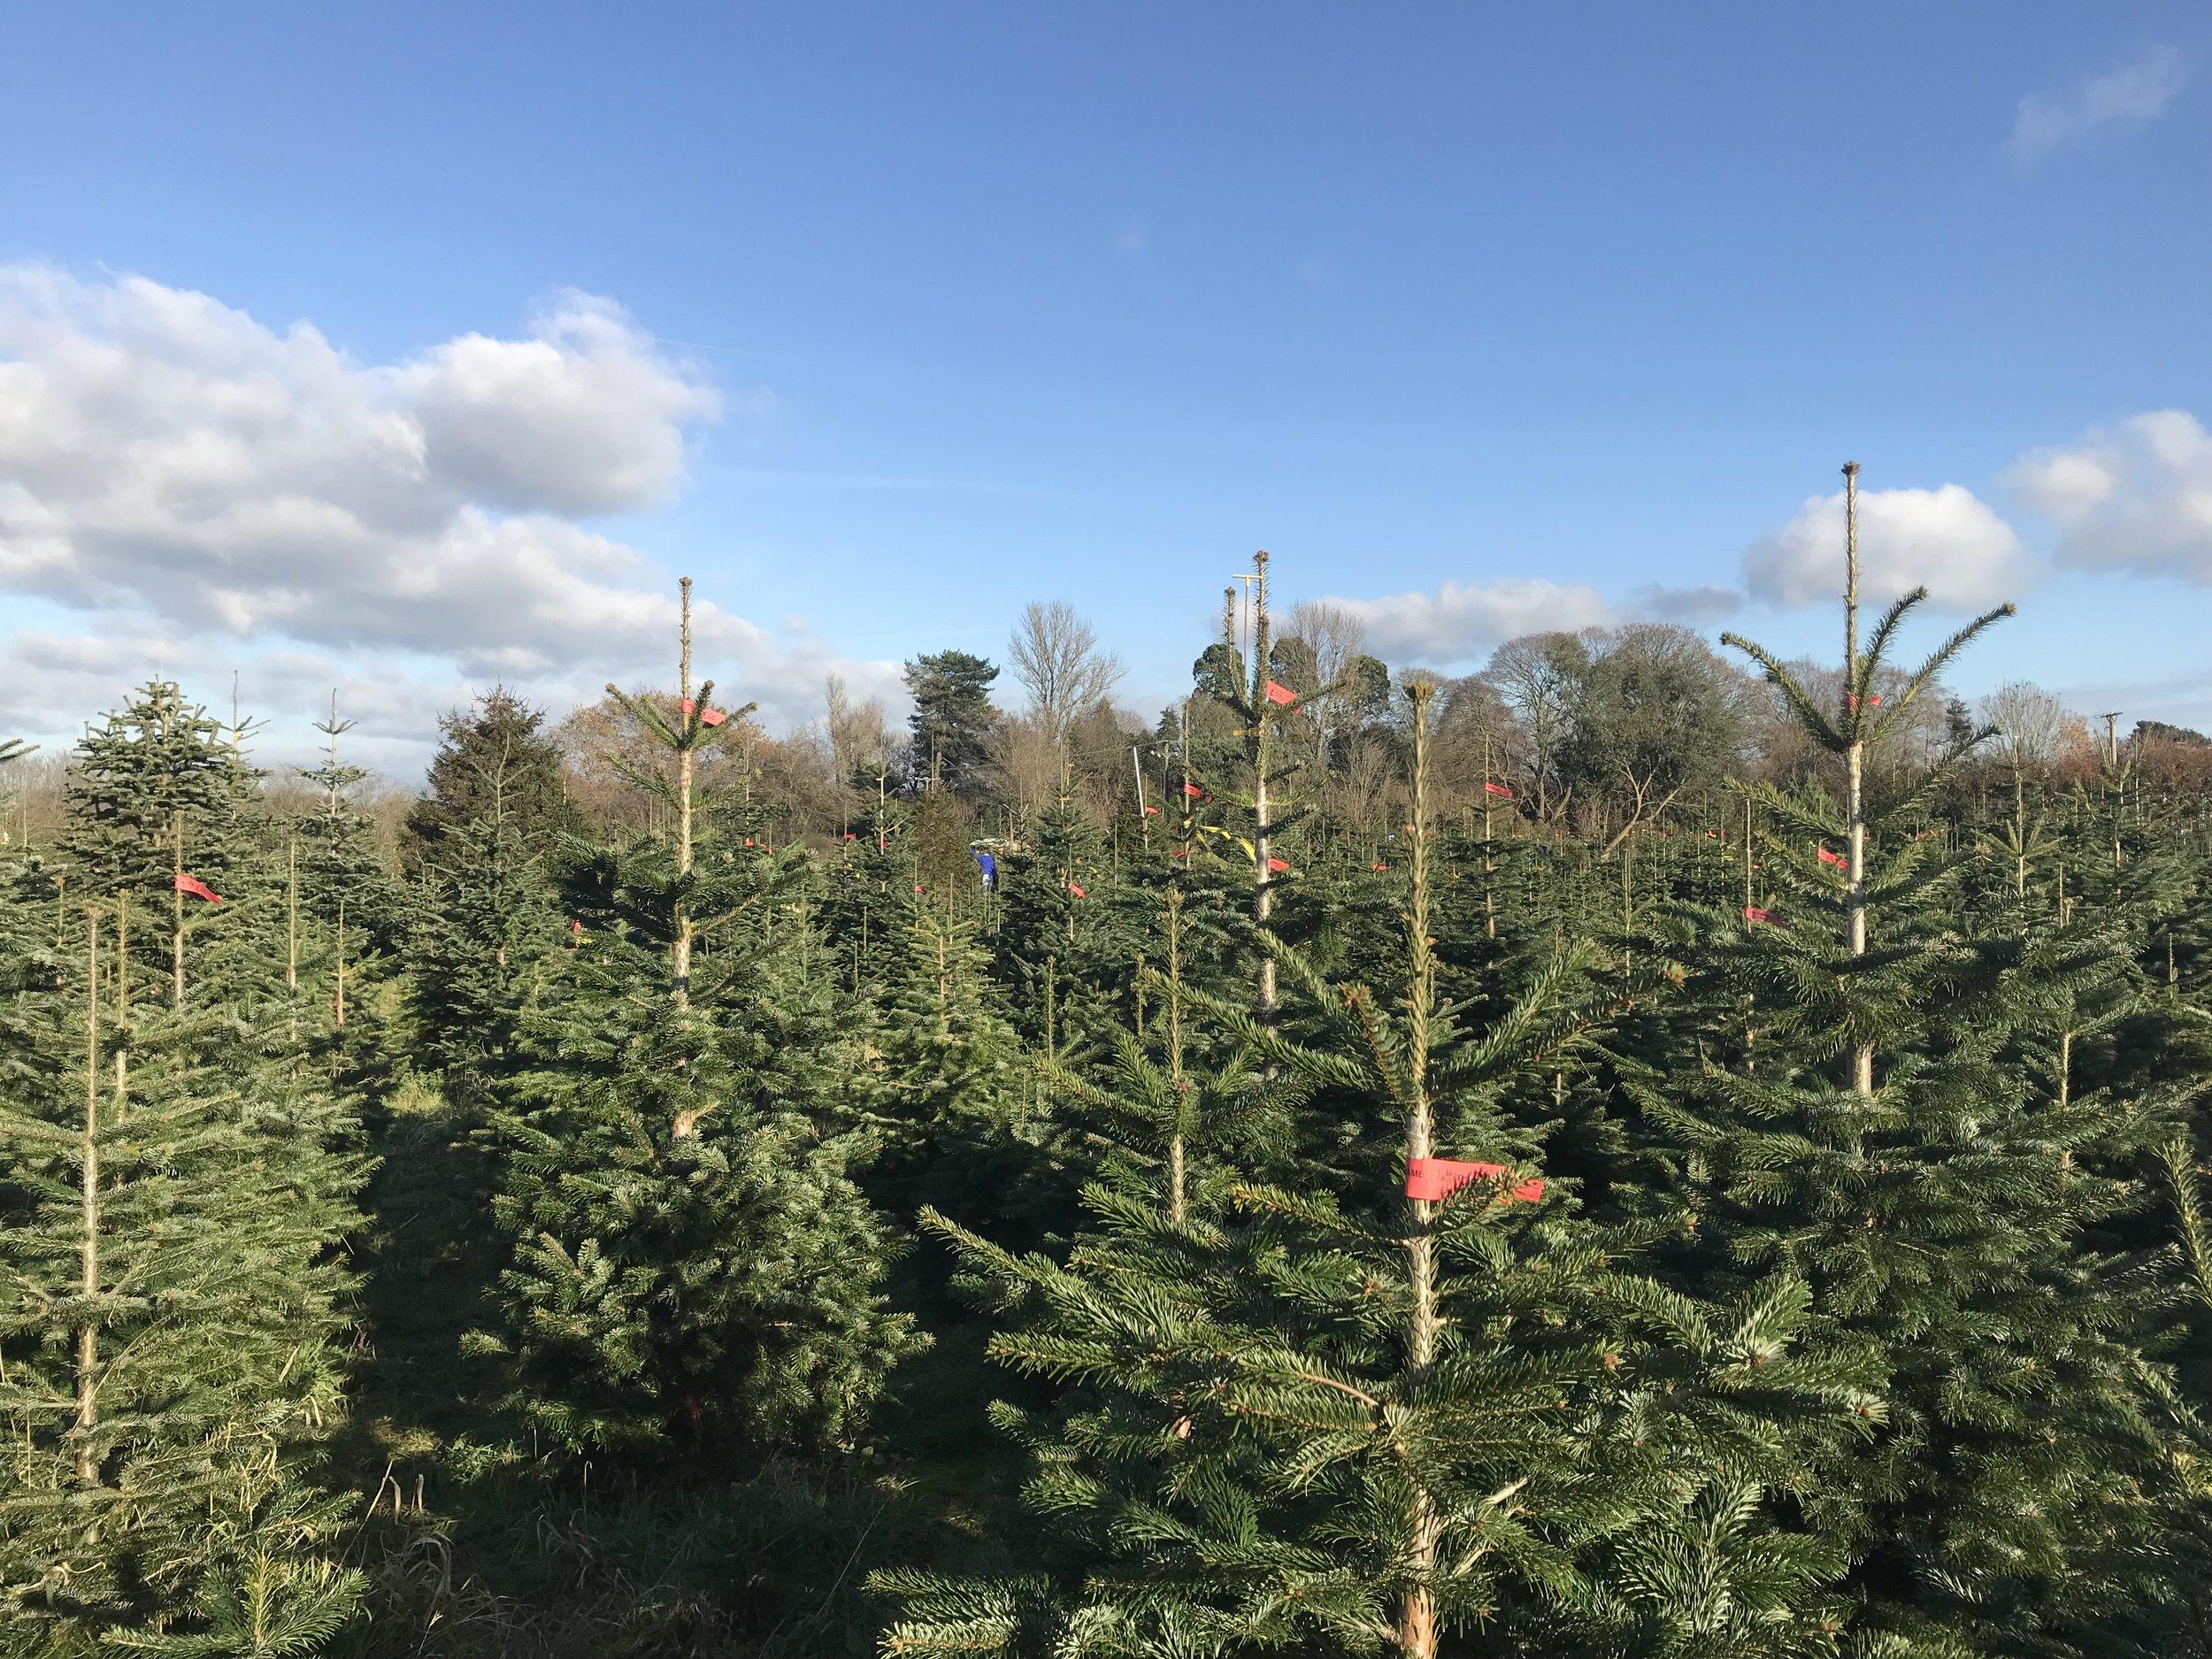 Frenchay Christmas Tree Farm, a magical land of joy!